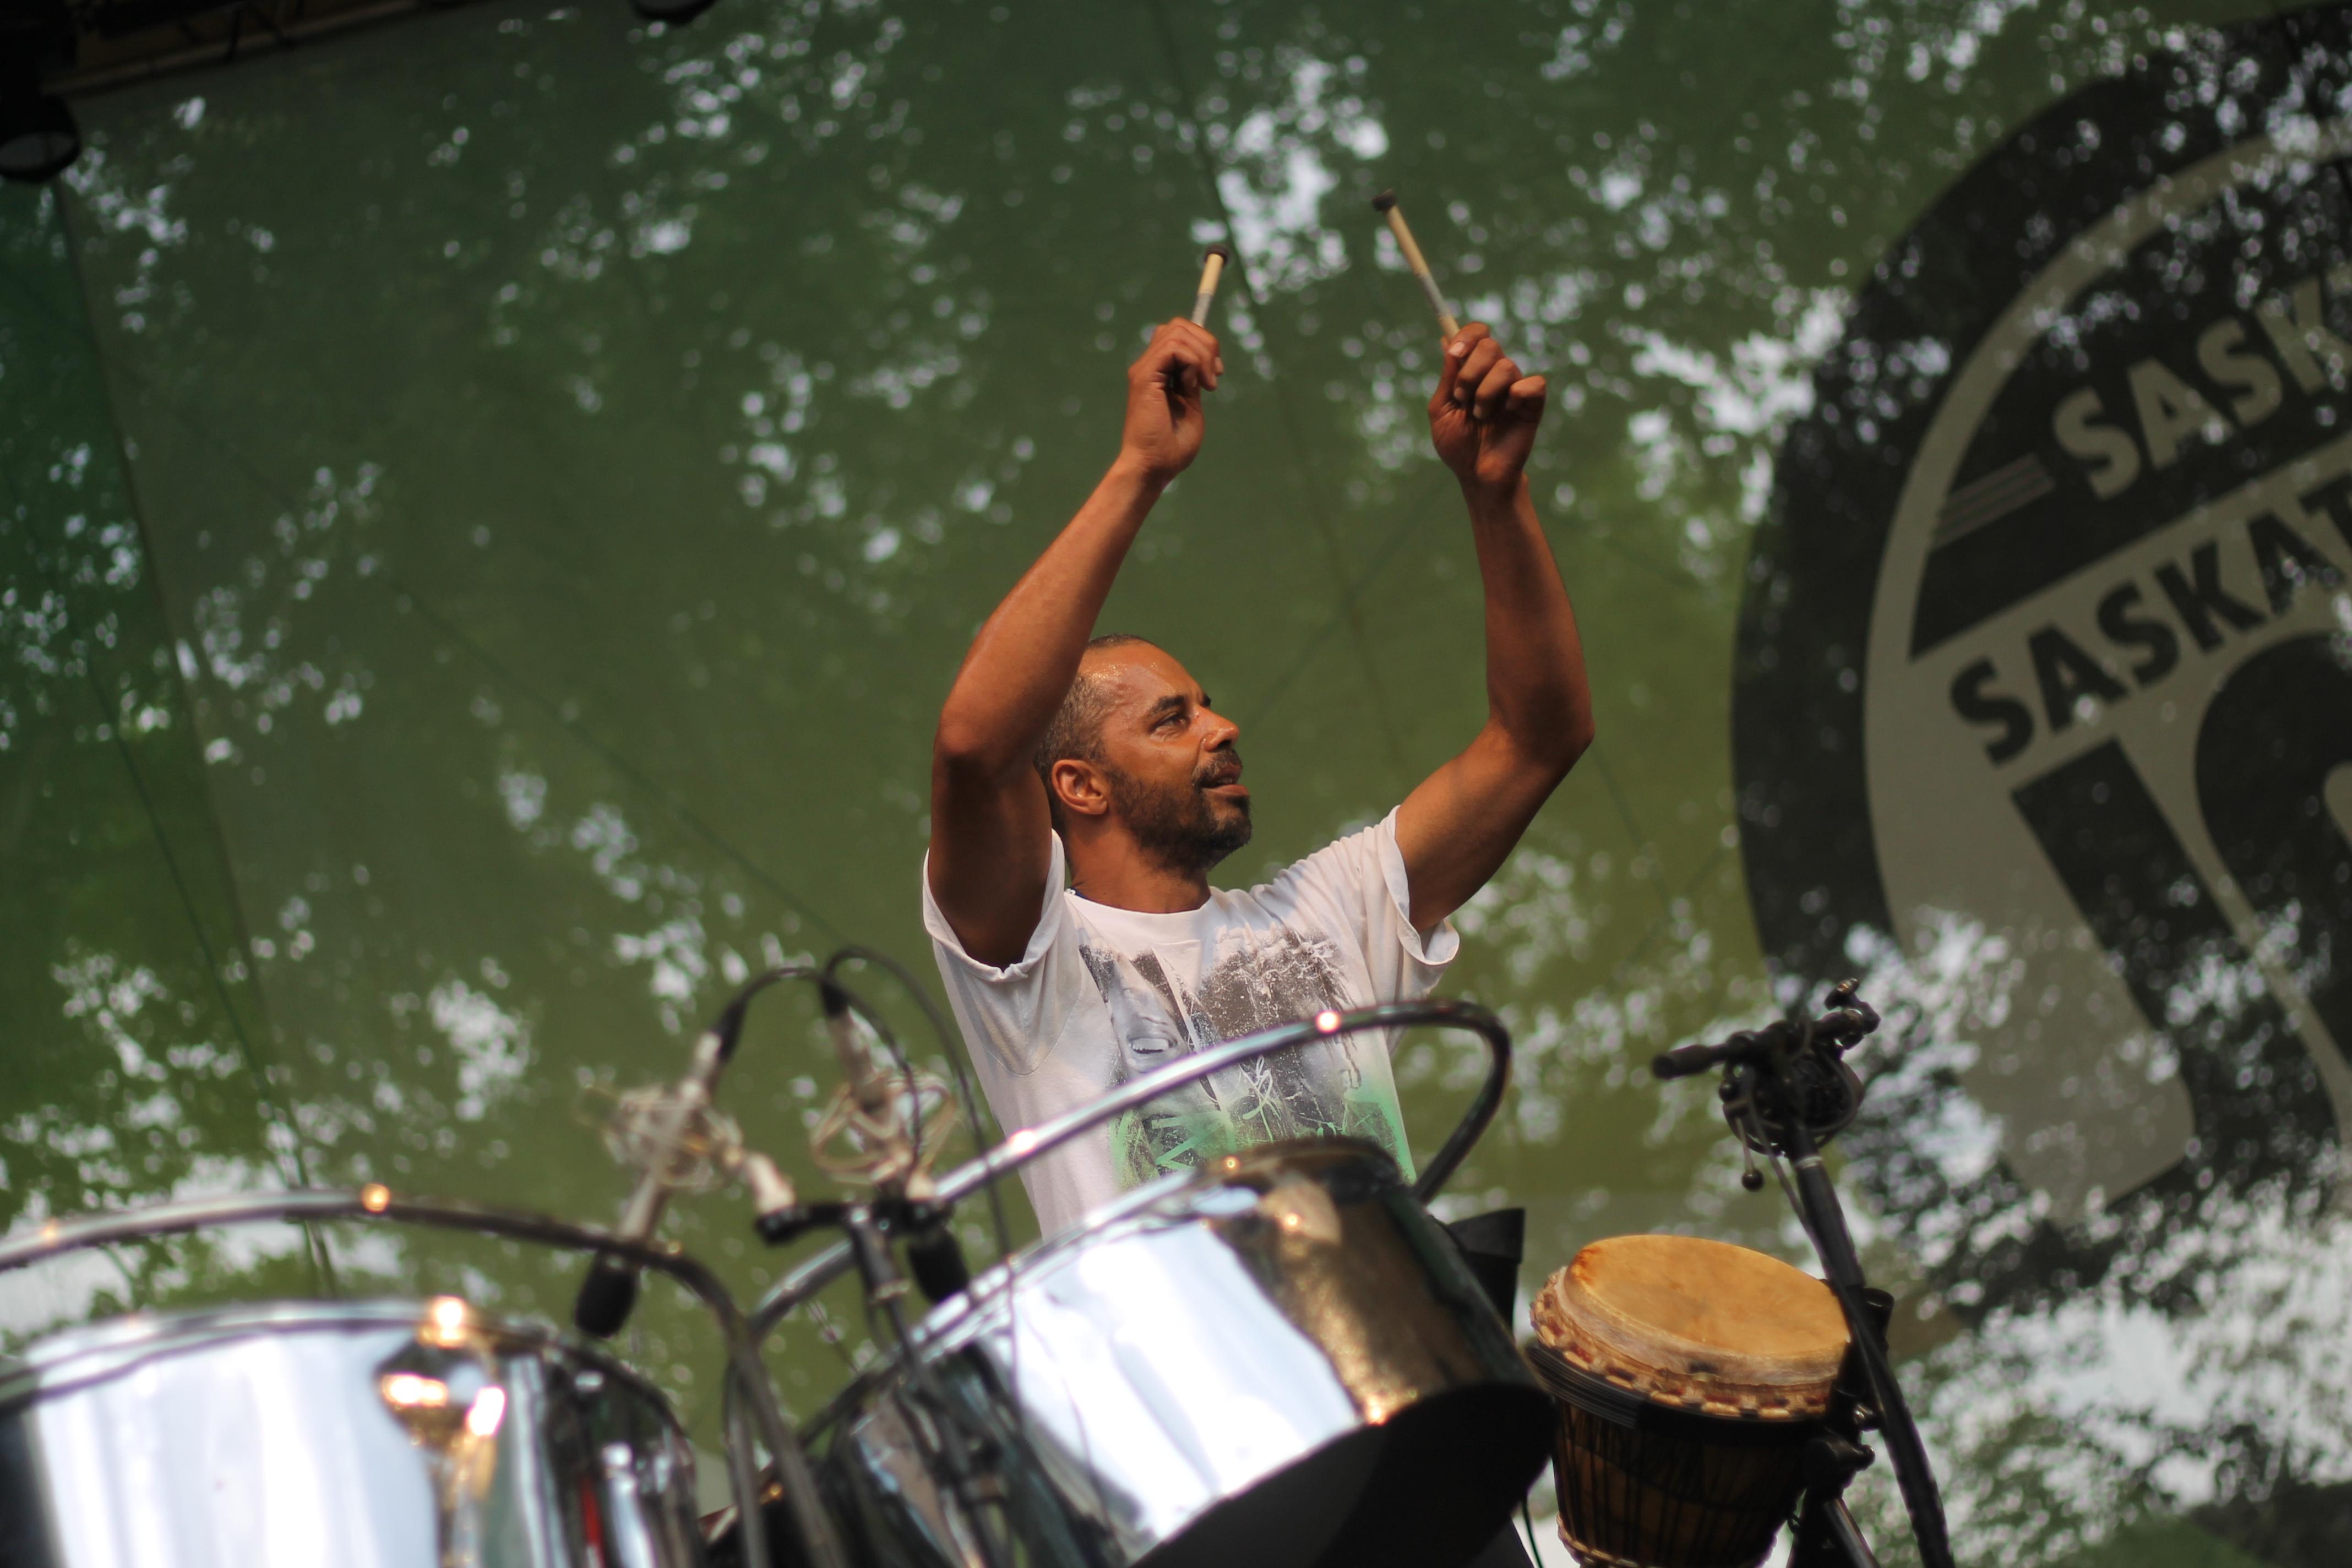 Sask Jazz Fest - The Steadies